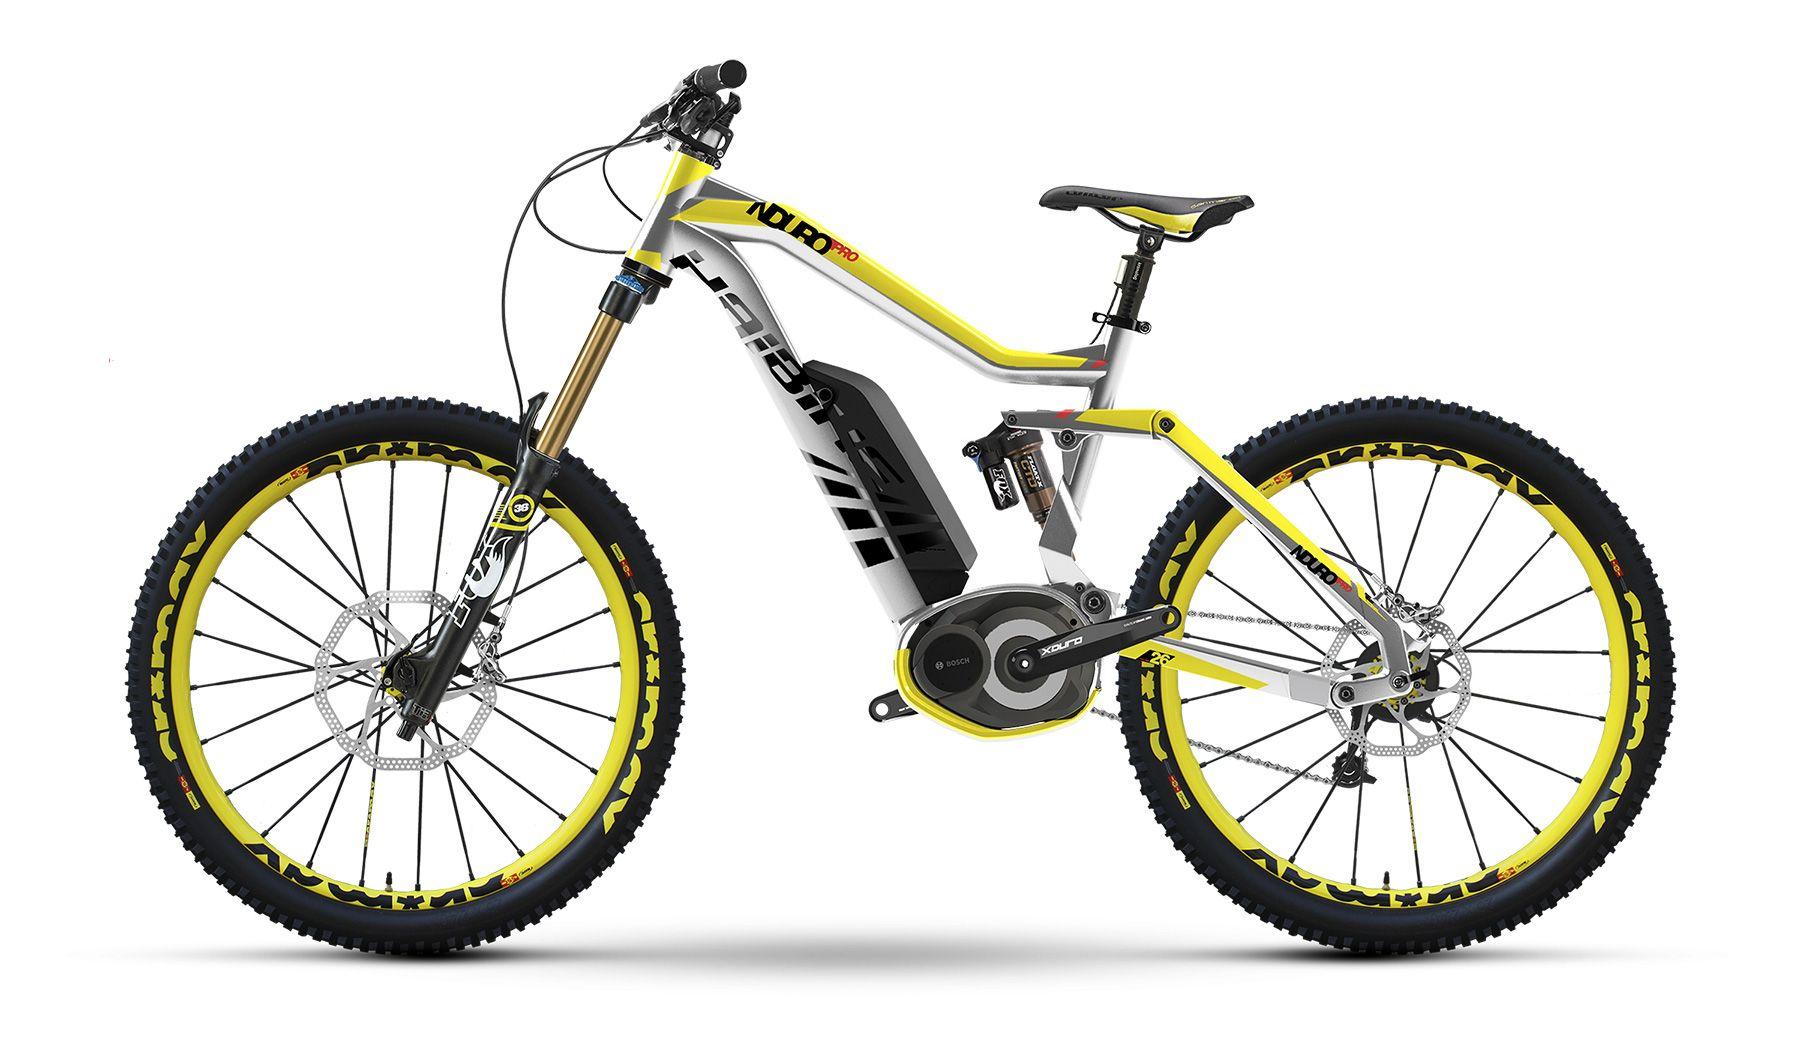 electric mountain bike - Google Search